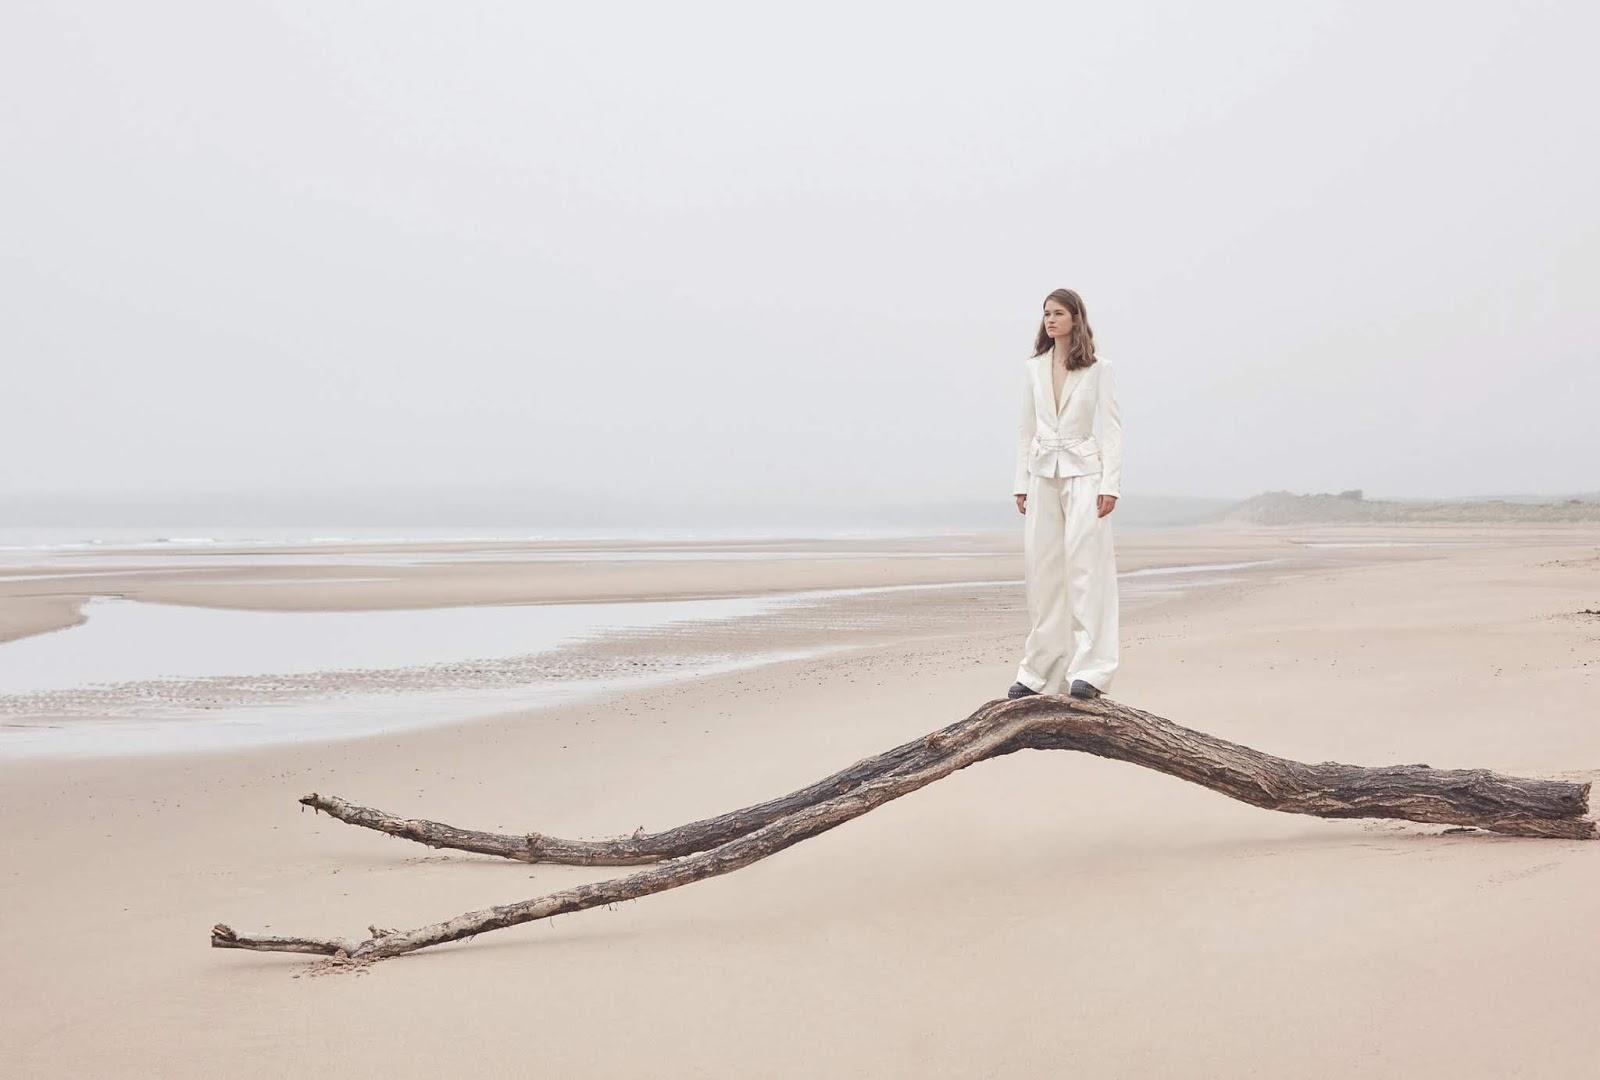 Femke Huijzer by Agata Pospieszynska for Harpers Bazaar UK September 2019  (2).jpg